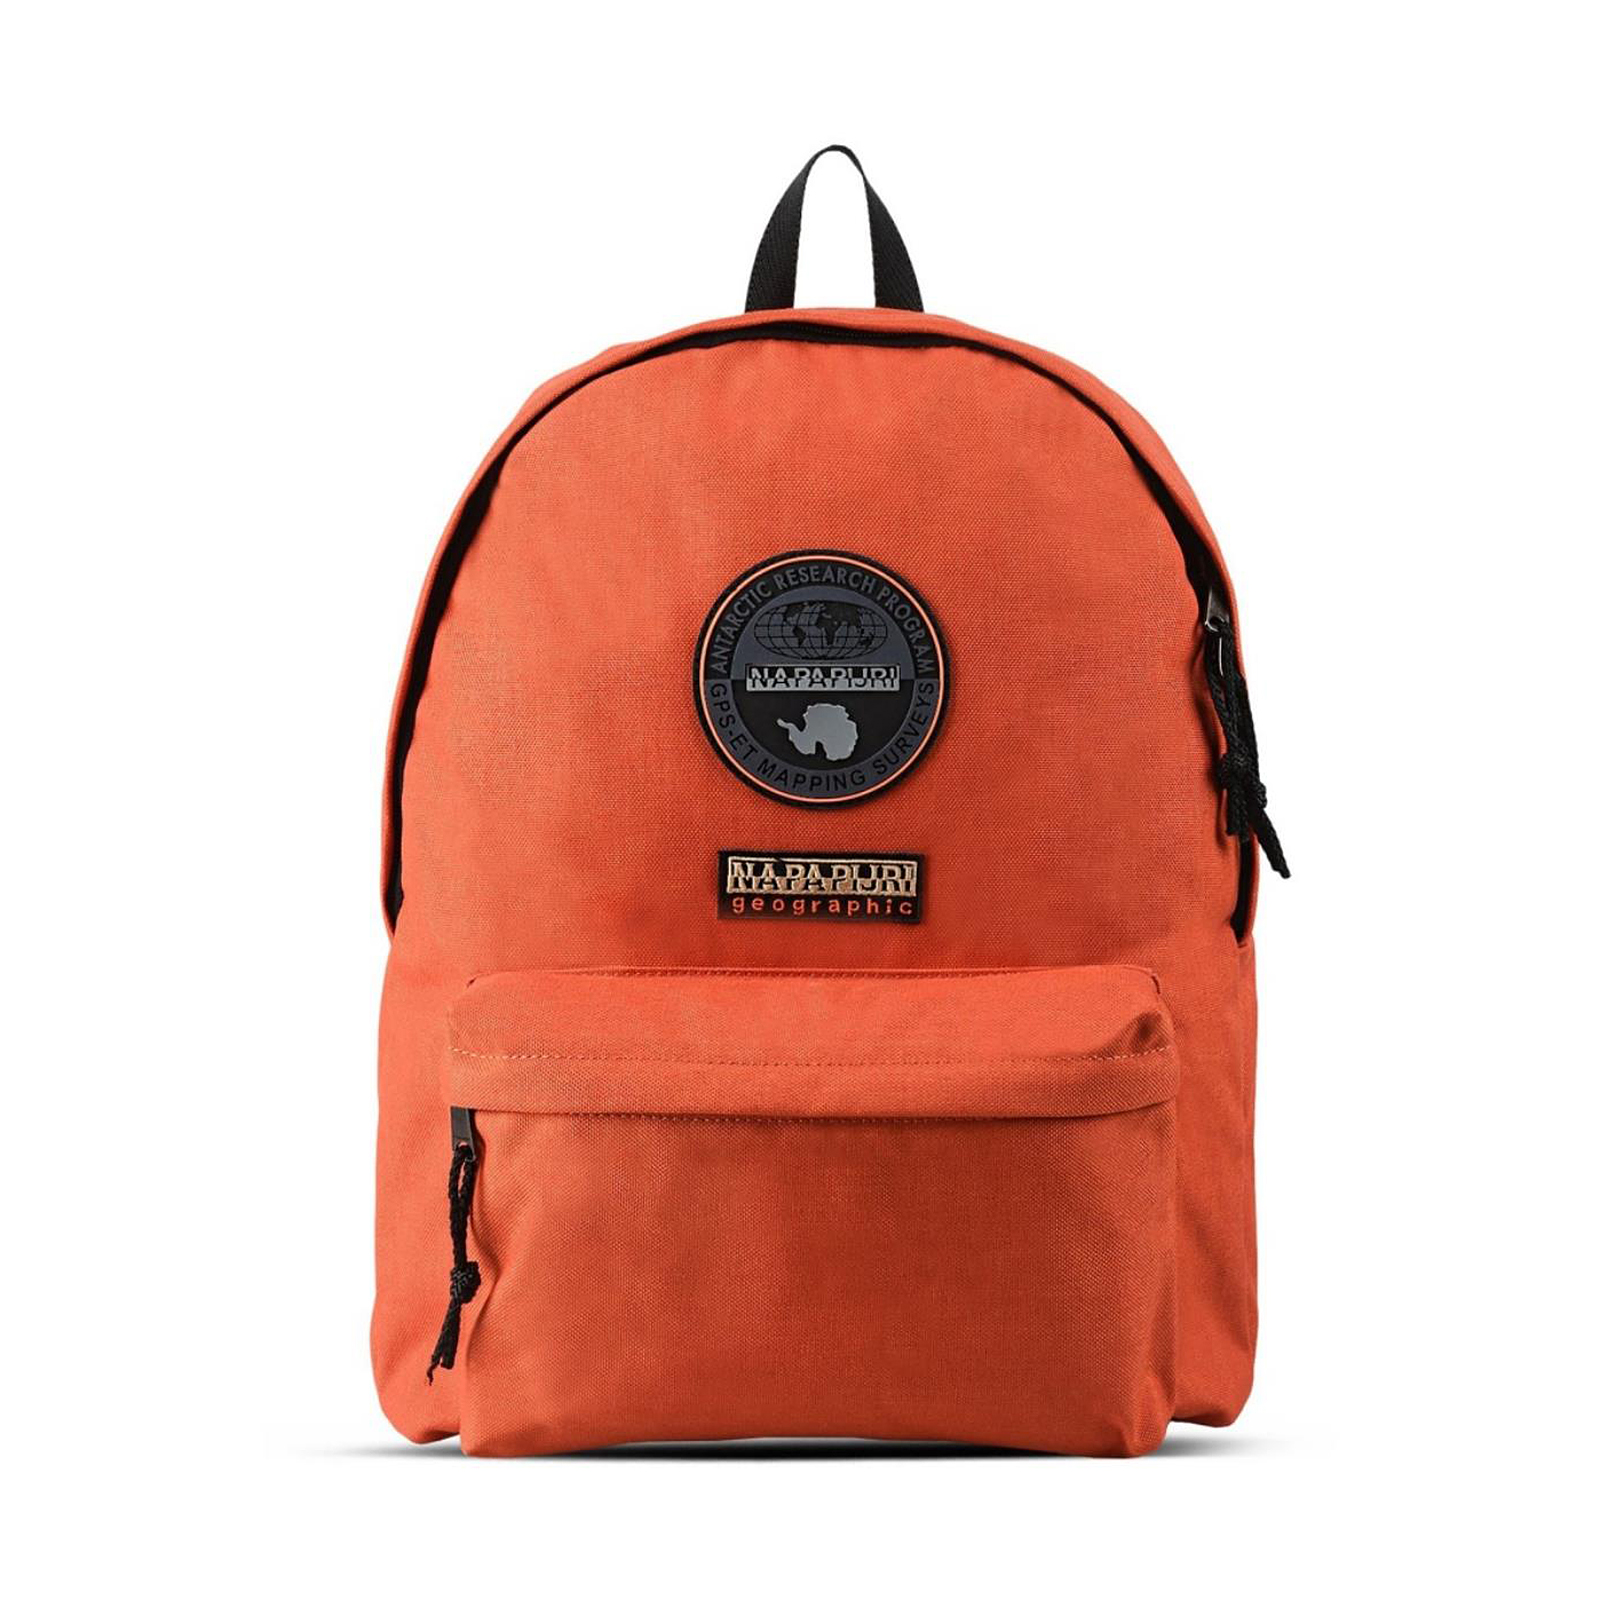 Napapijri Zaini Voyage 1 Orange Arancione  2bf0cf0013a